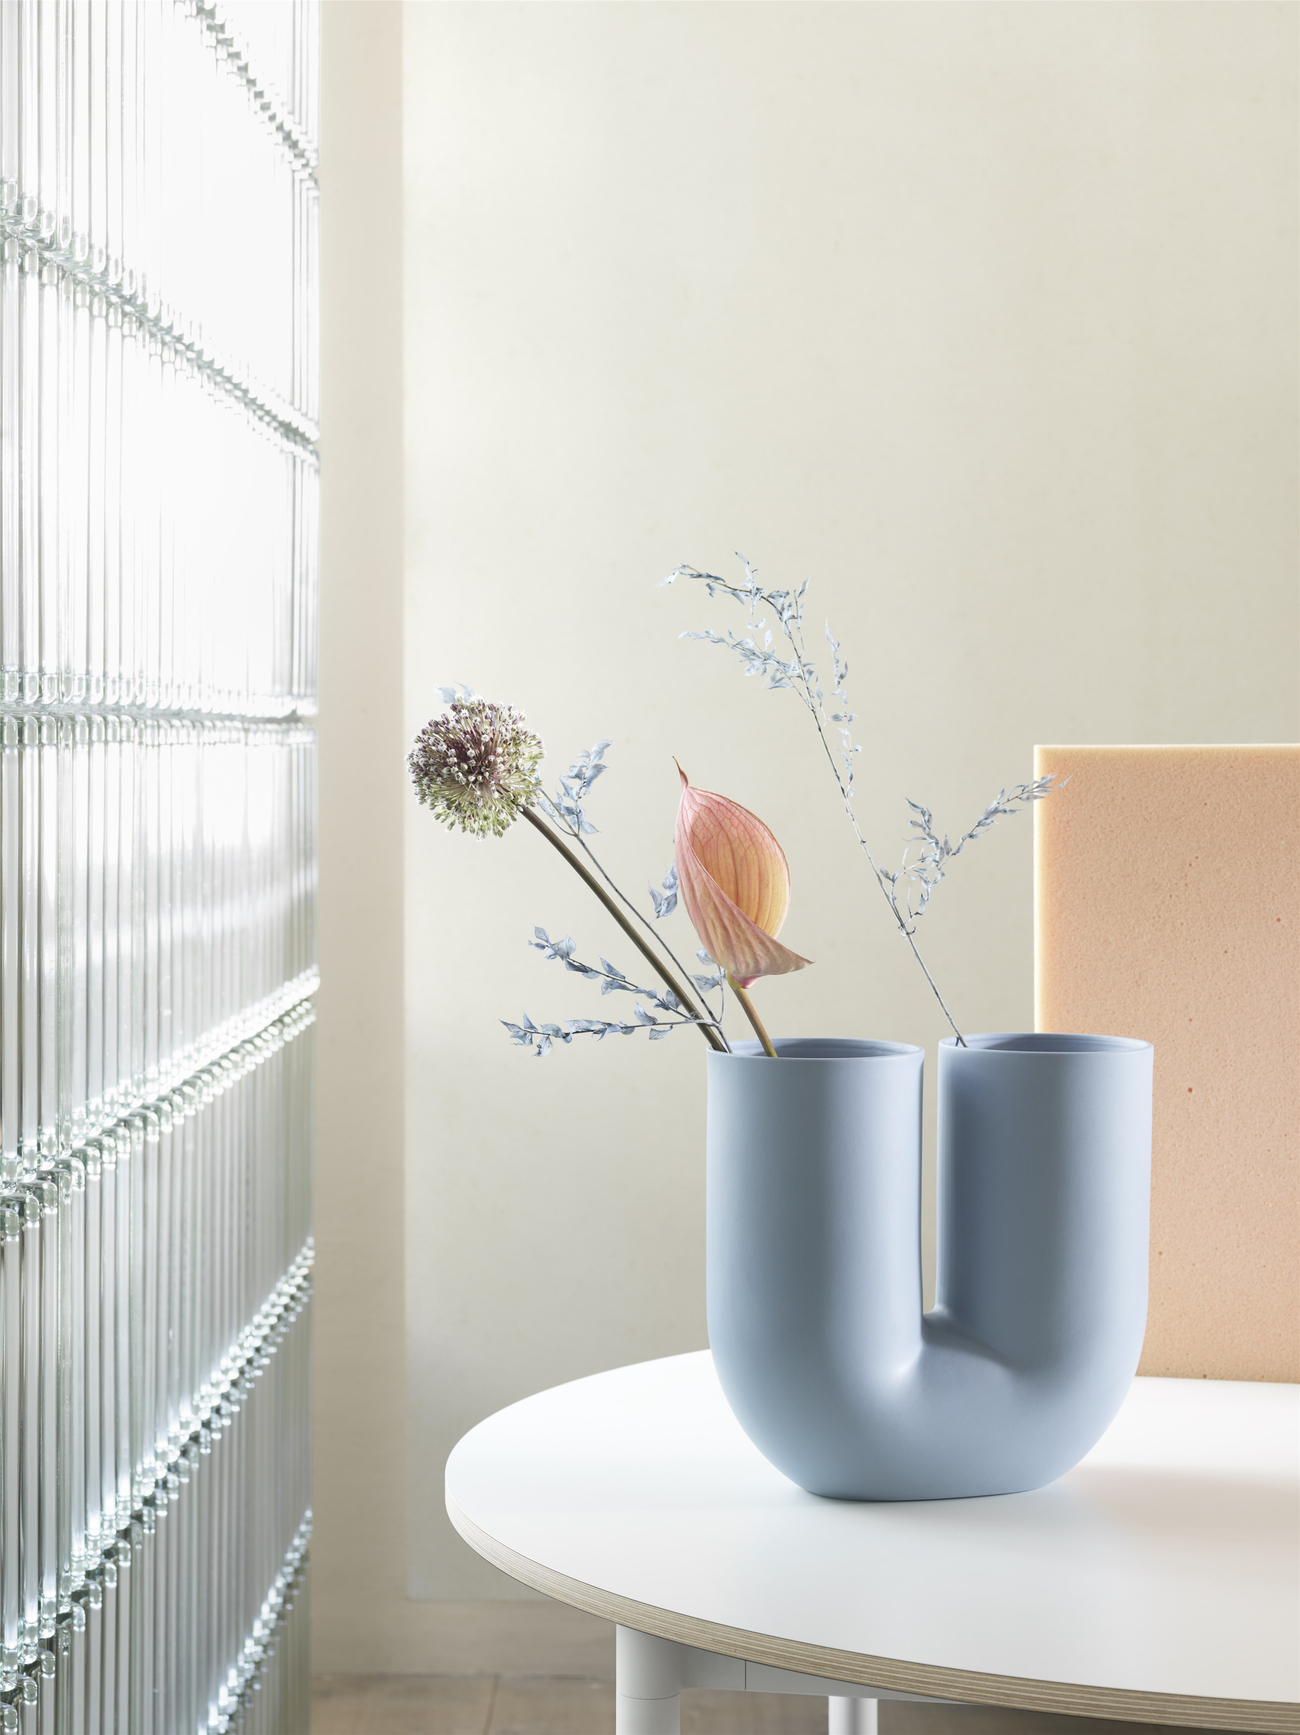 https://www.fundesign.nl/media/catalog/product/k/i/kink-vase-base-table-round-muuto-org__150_.jpg